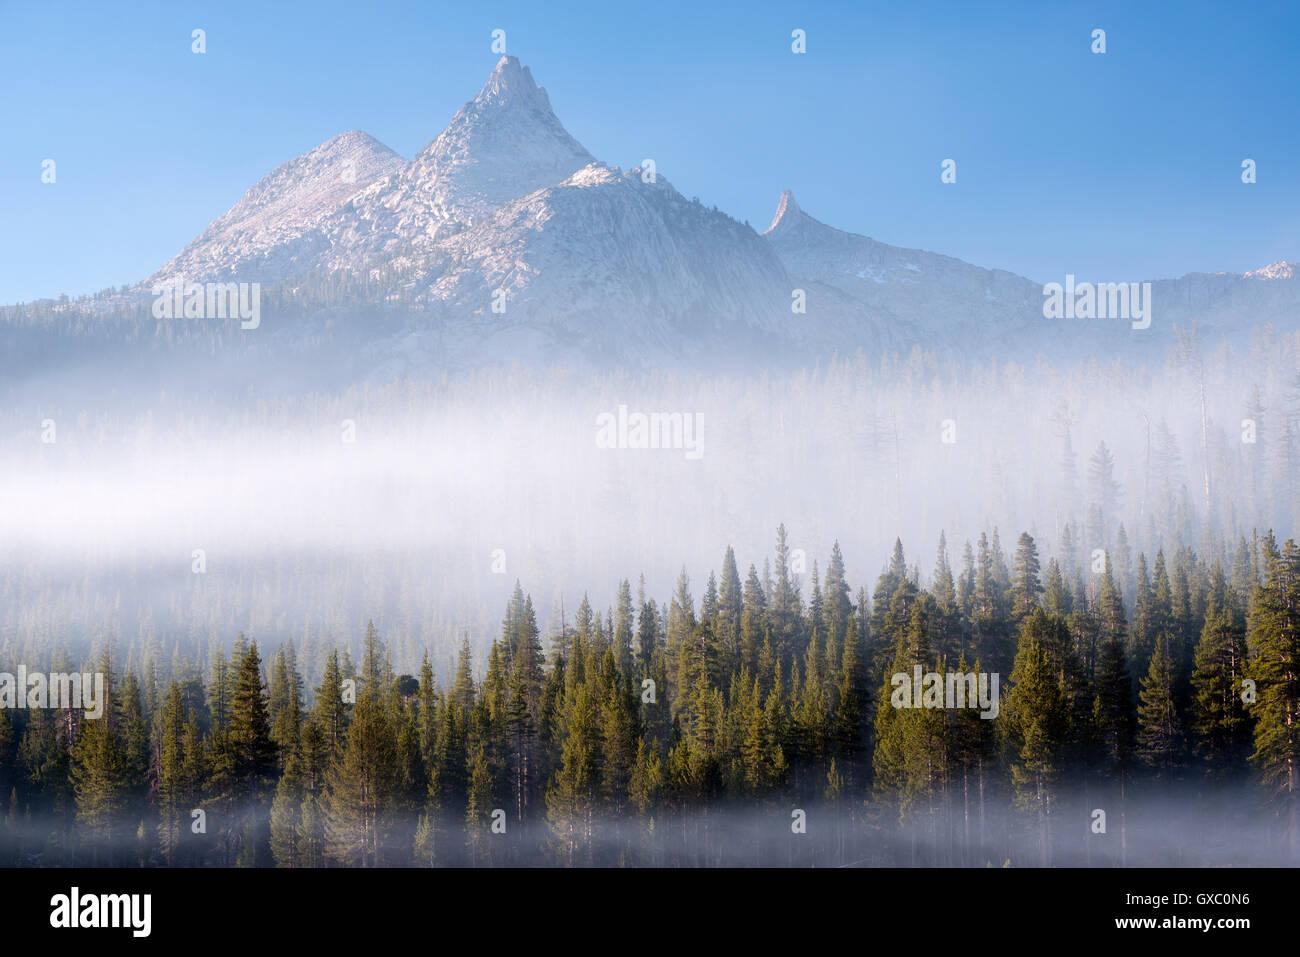 Mist surrounding the forest below Unicorn Peak, Yosemite National Park, California, USA. Autumn (October) 2014. - Stock Image